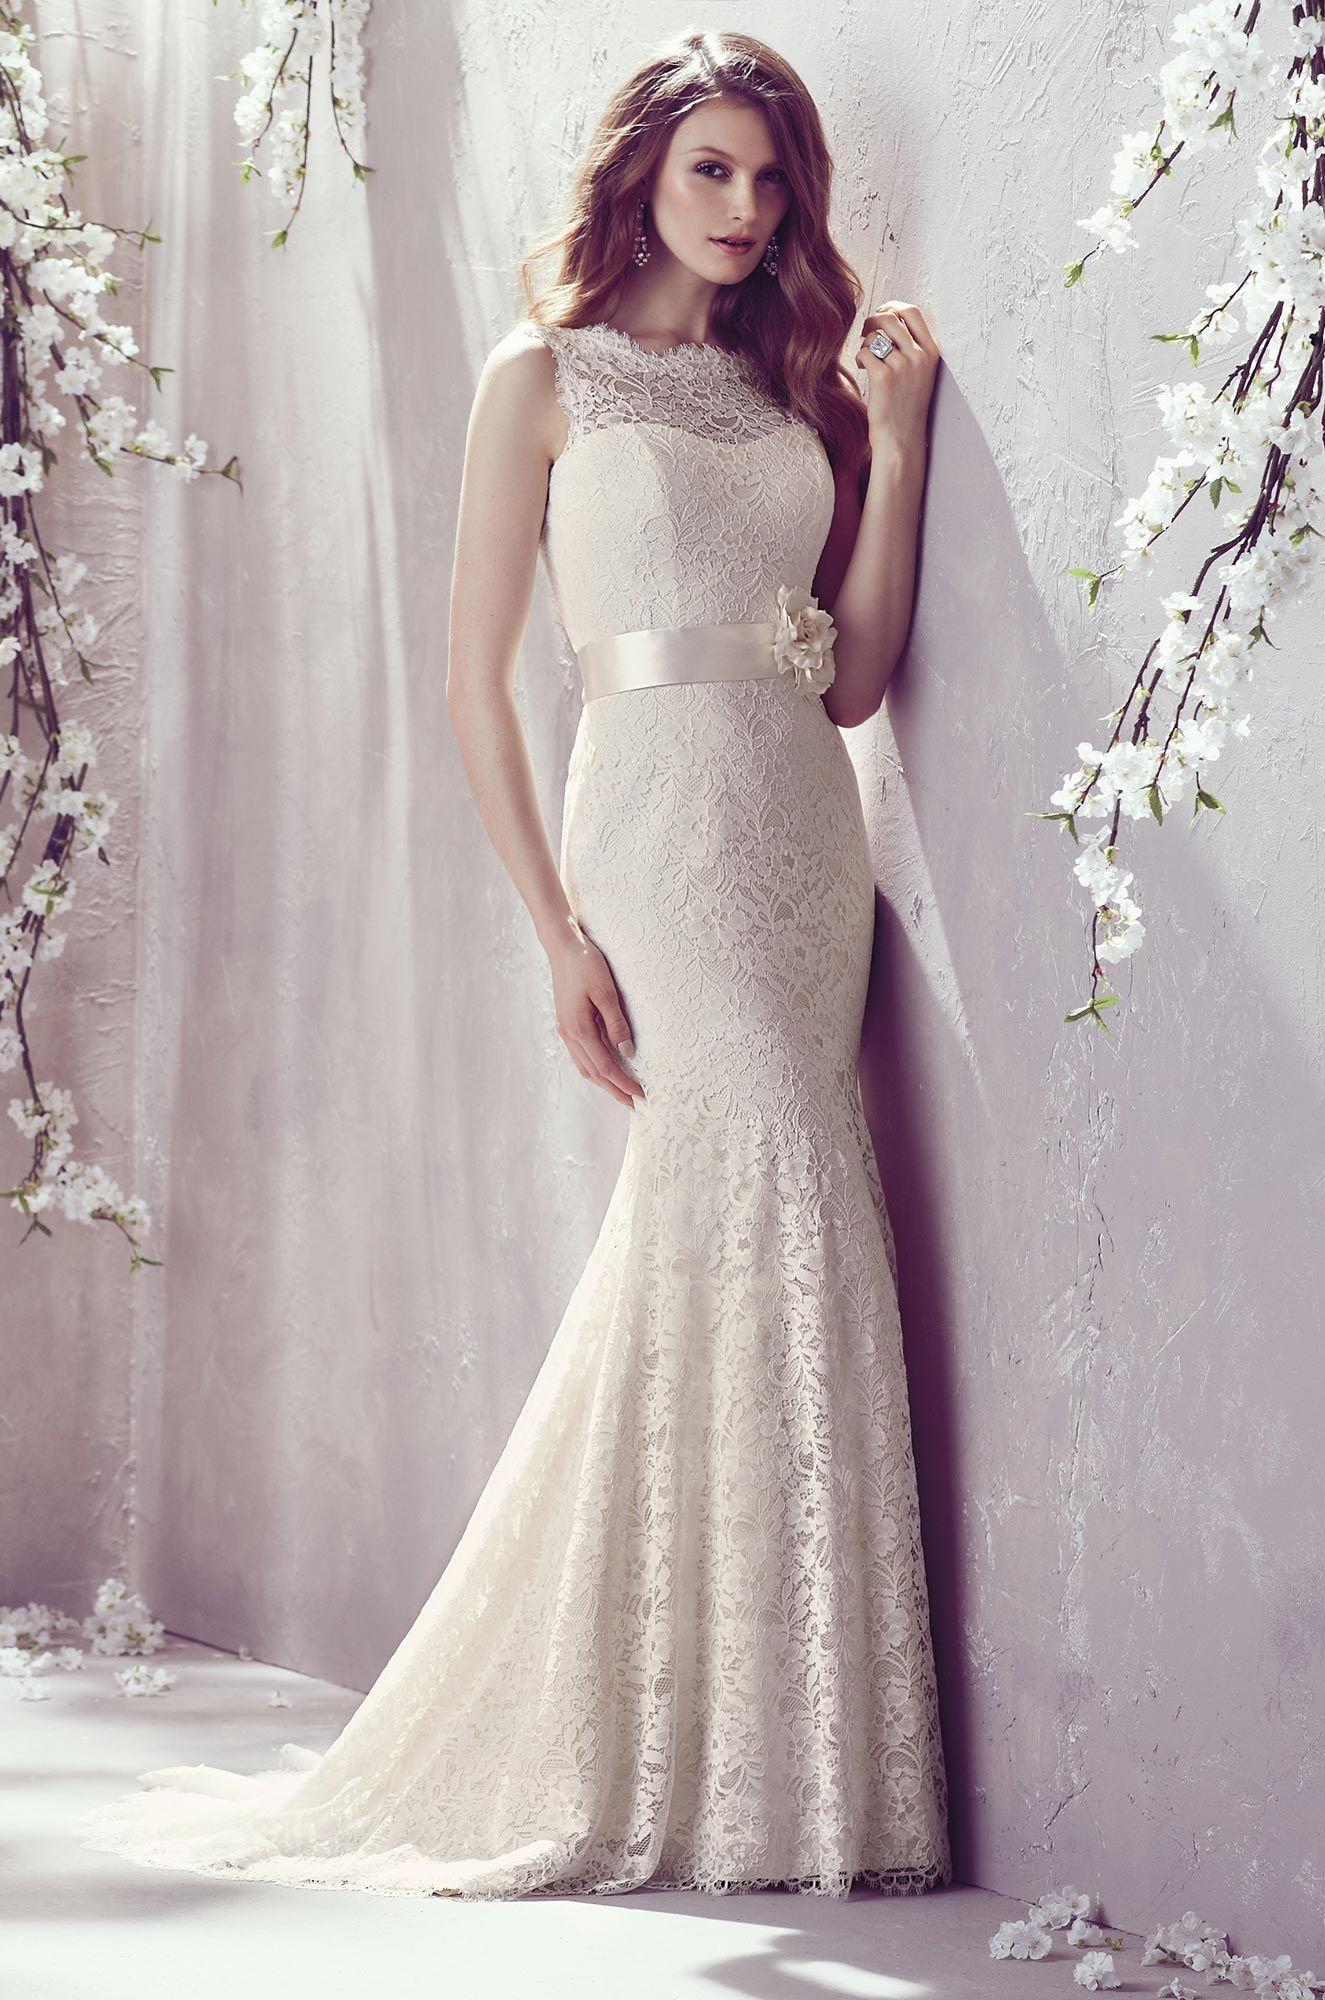 Lace Neckline Wedding Dress - Style #1802 | Mikaella bridal, Lace ...